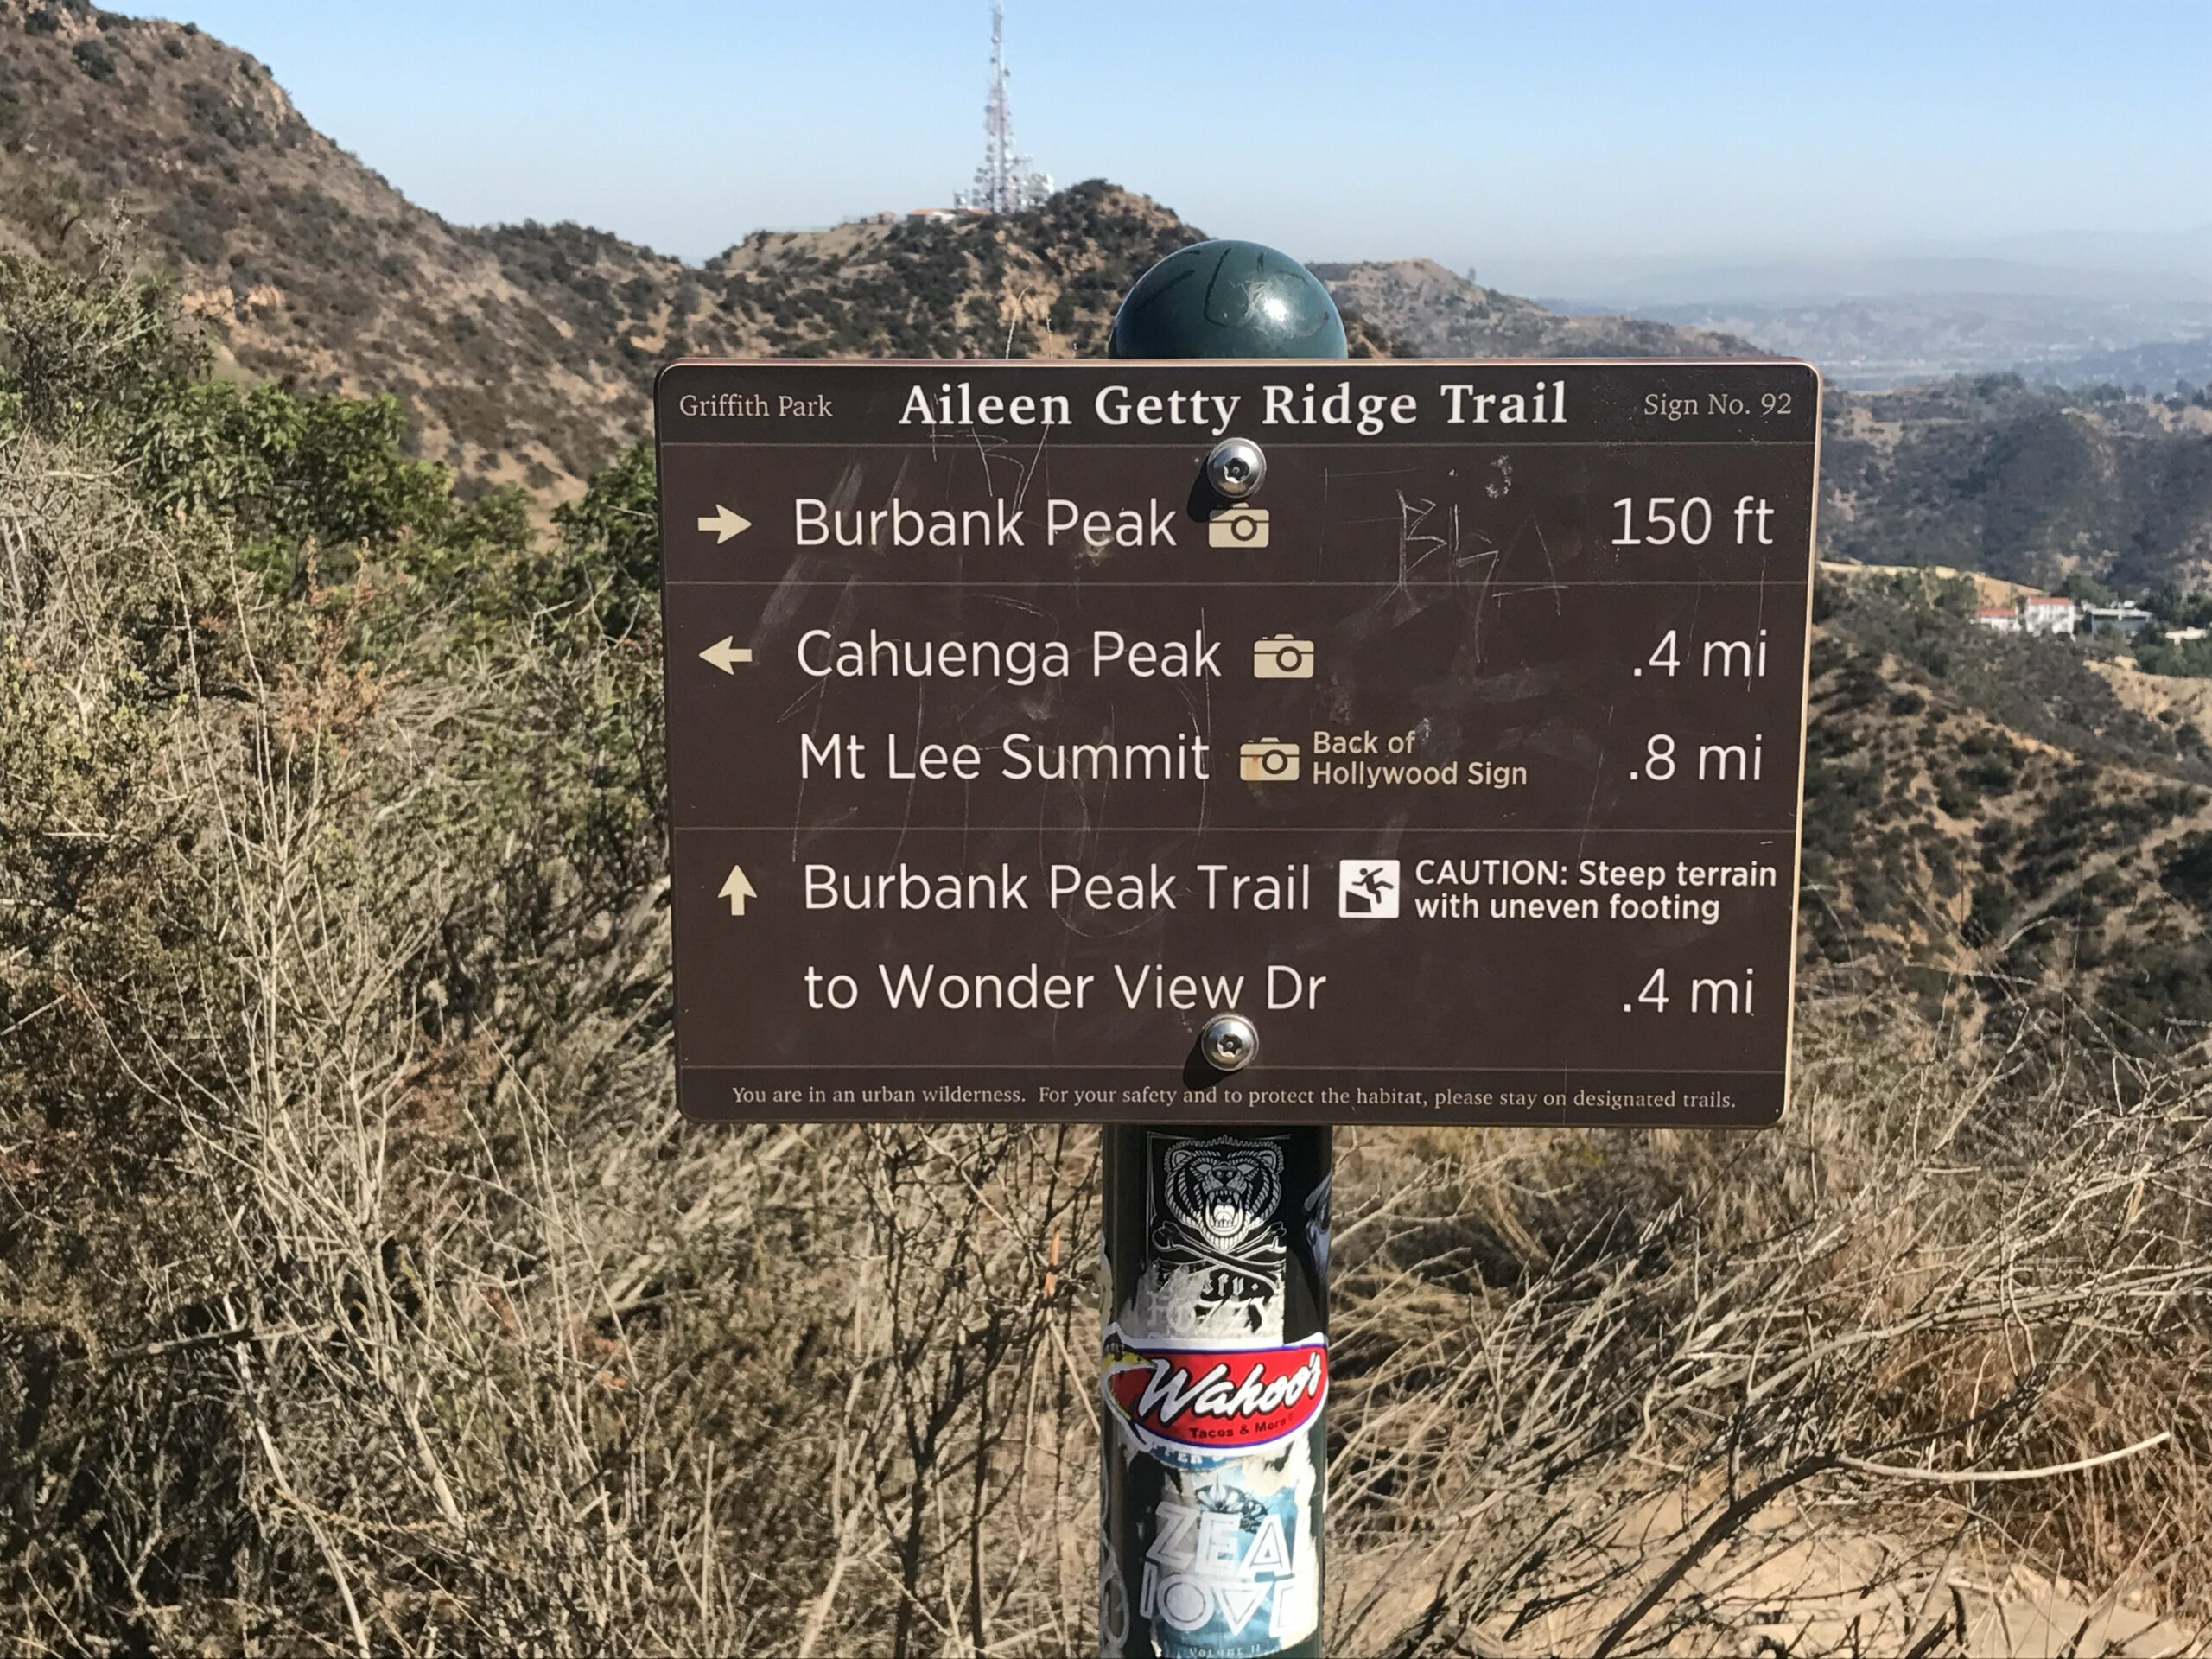 Burbank Peak Trail